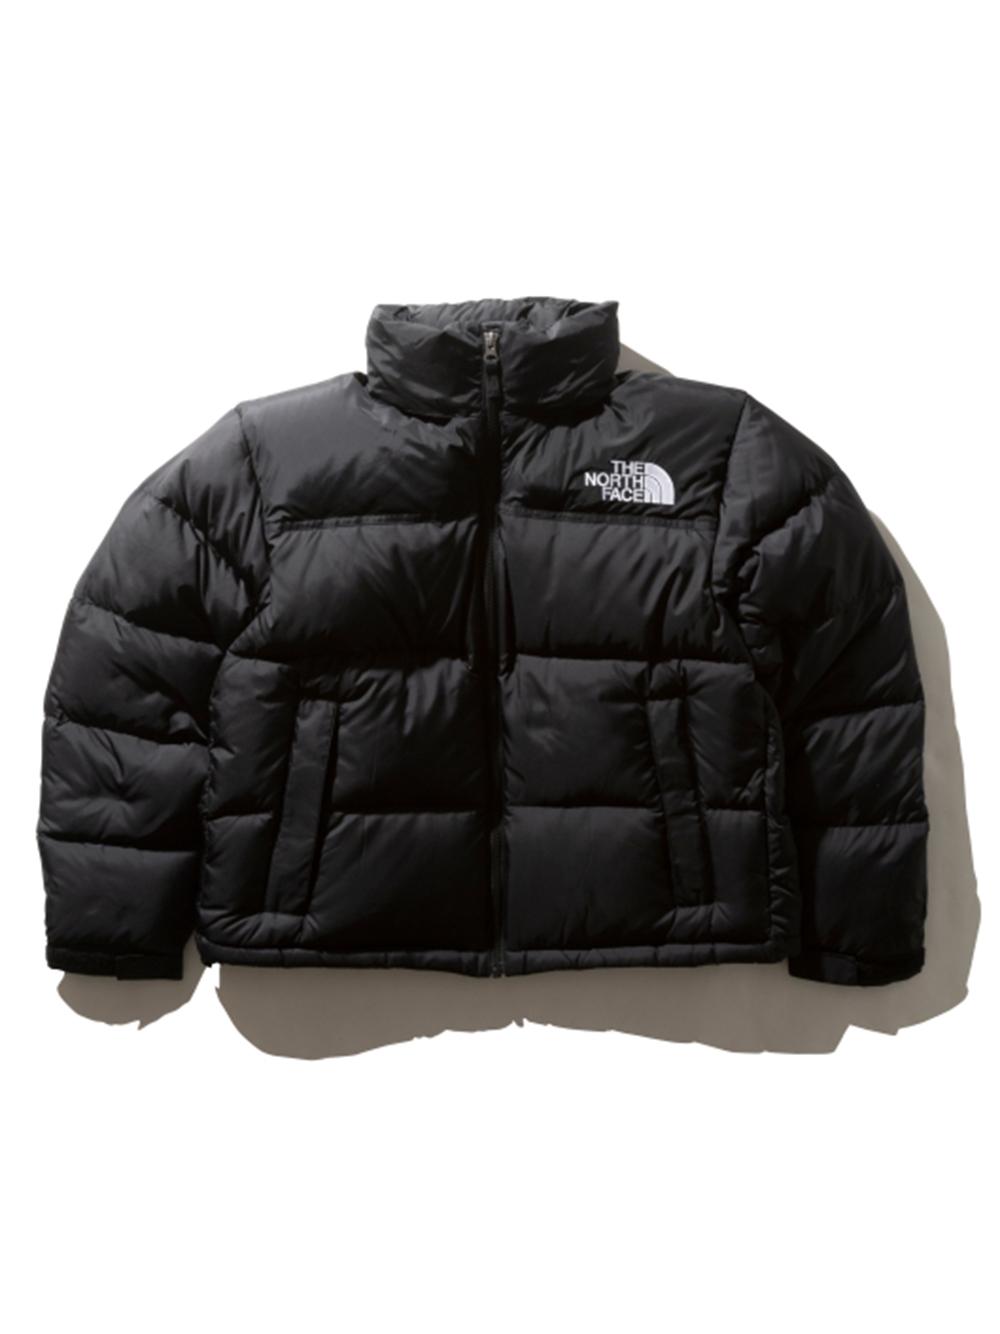 【THE NORTH FACE】Short Nuptse Jacket(BLK-M)